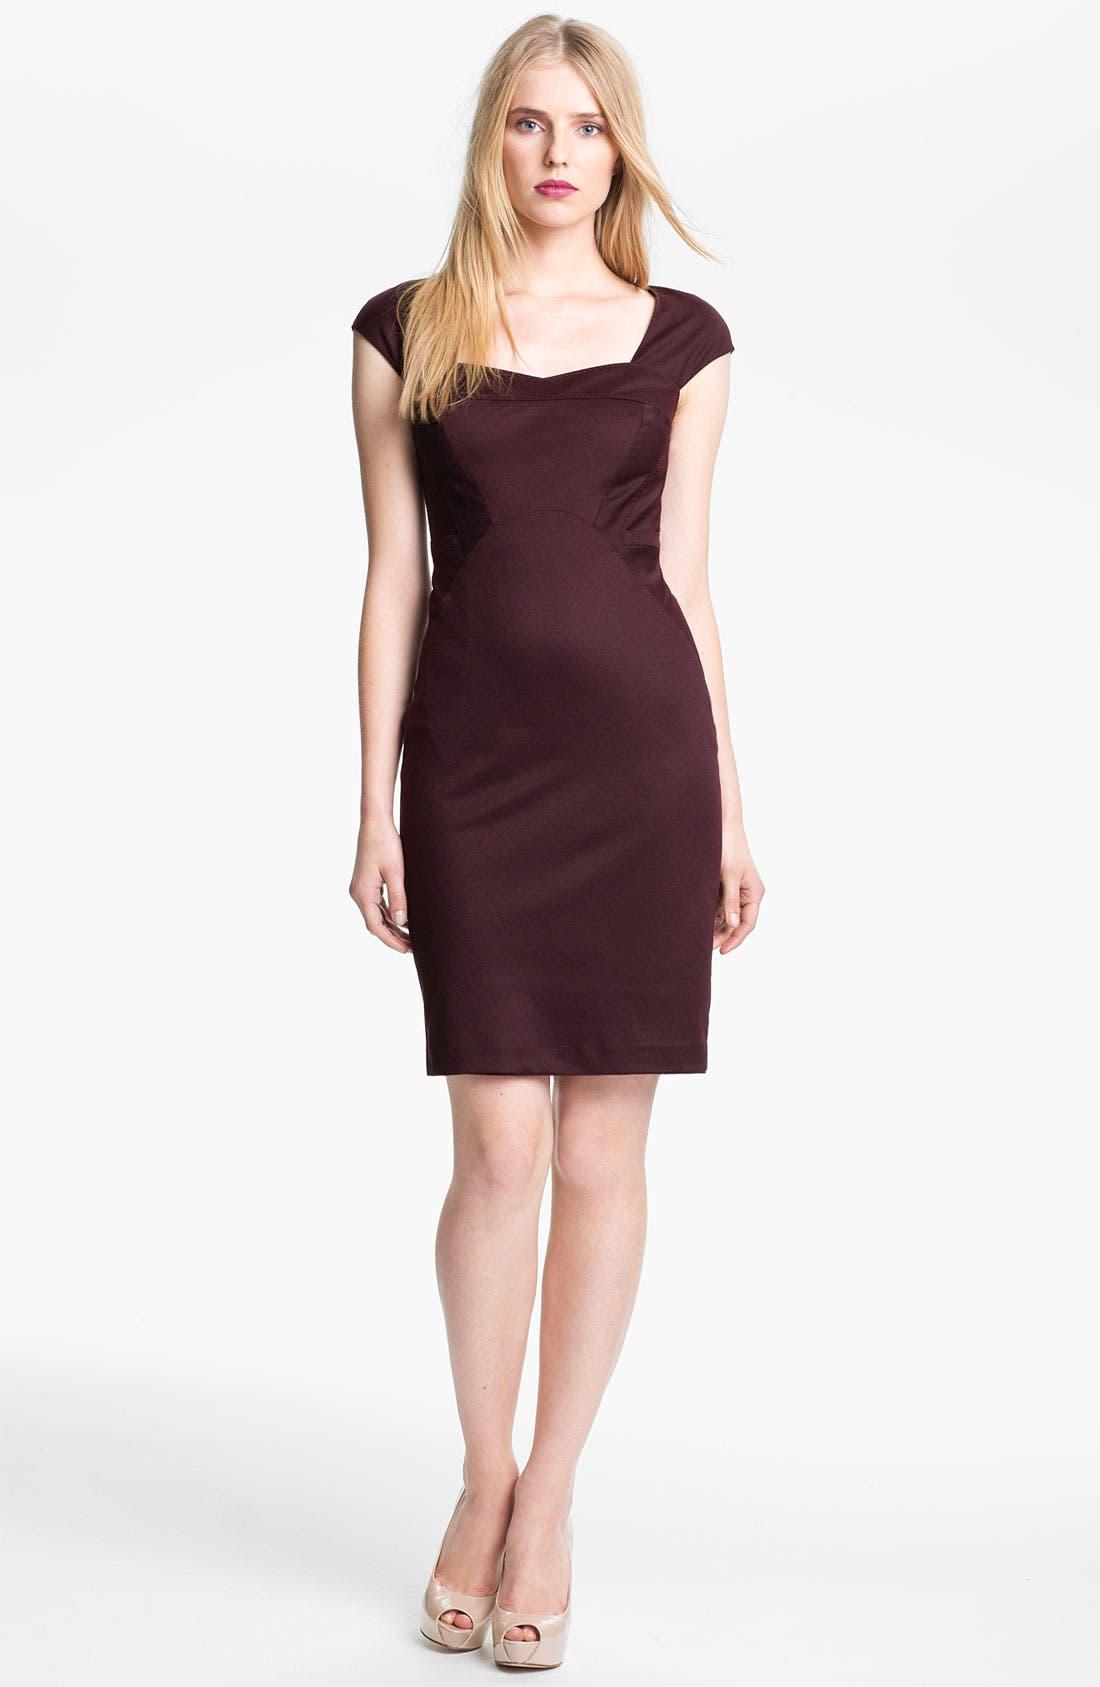 Alternate Image 1 Selected - Ted Baker London 'Priad' Wool Blend Sheath Dress